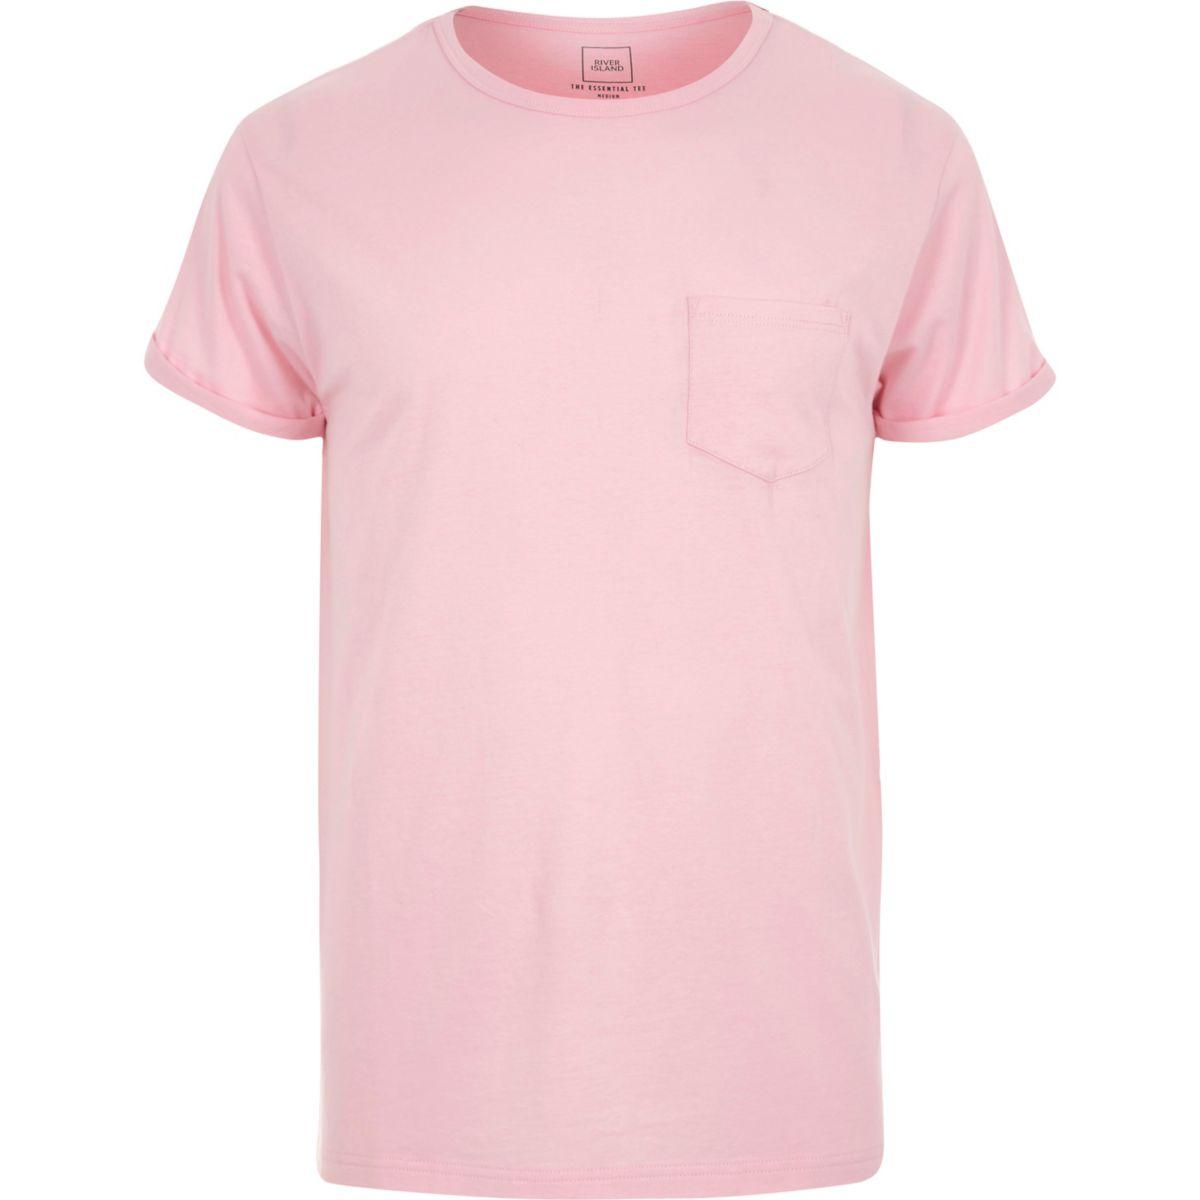 Pink rolled sleeve pocket T-shirt